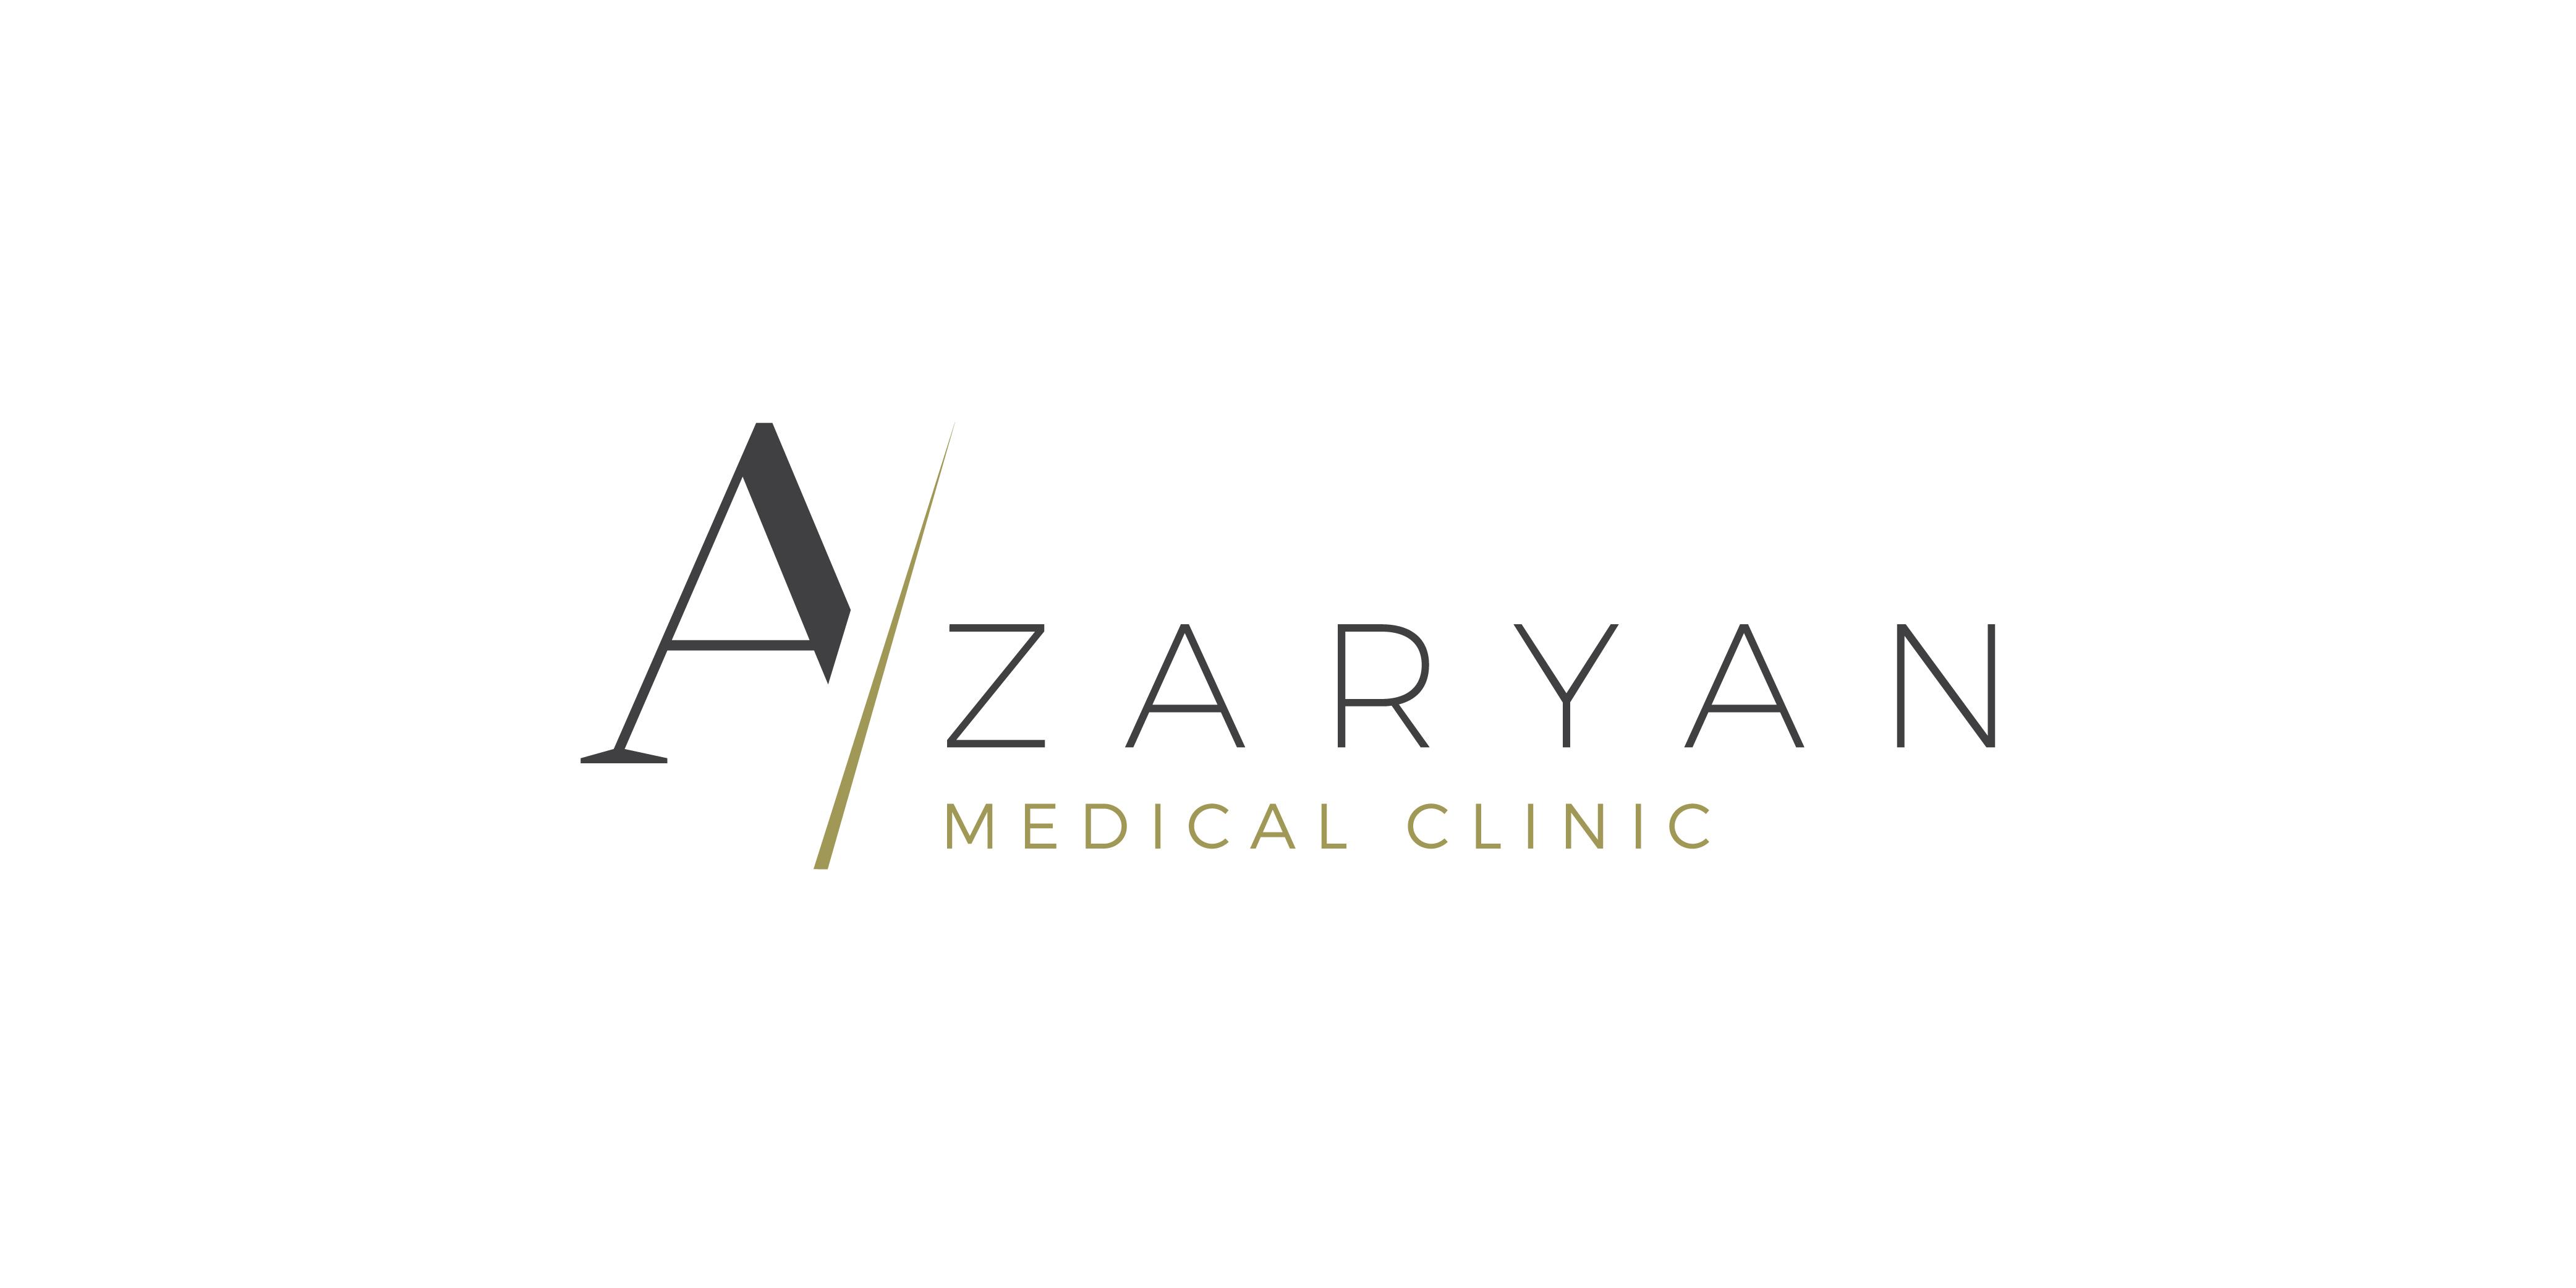 Azaryan Medical Clinic